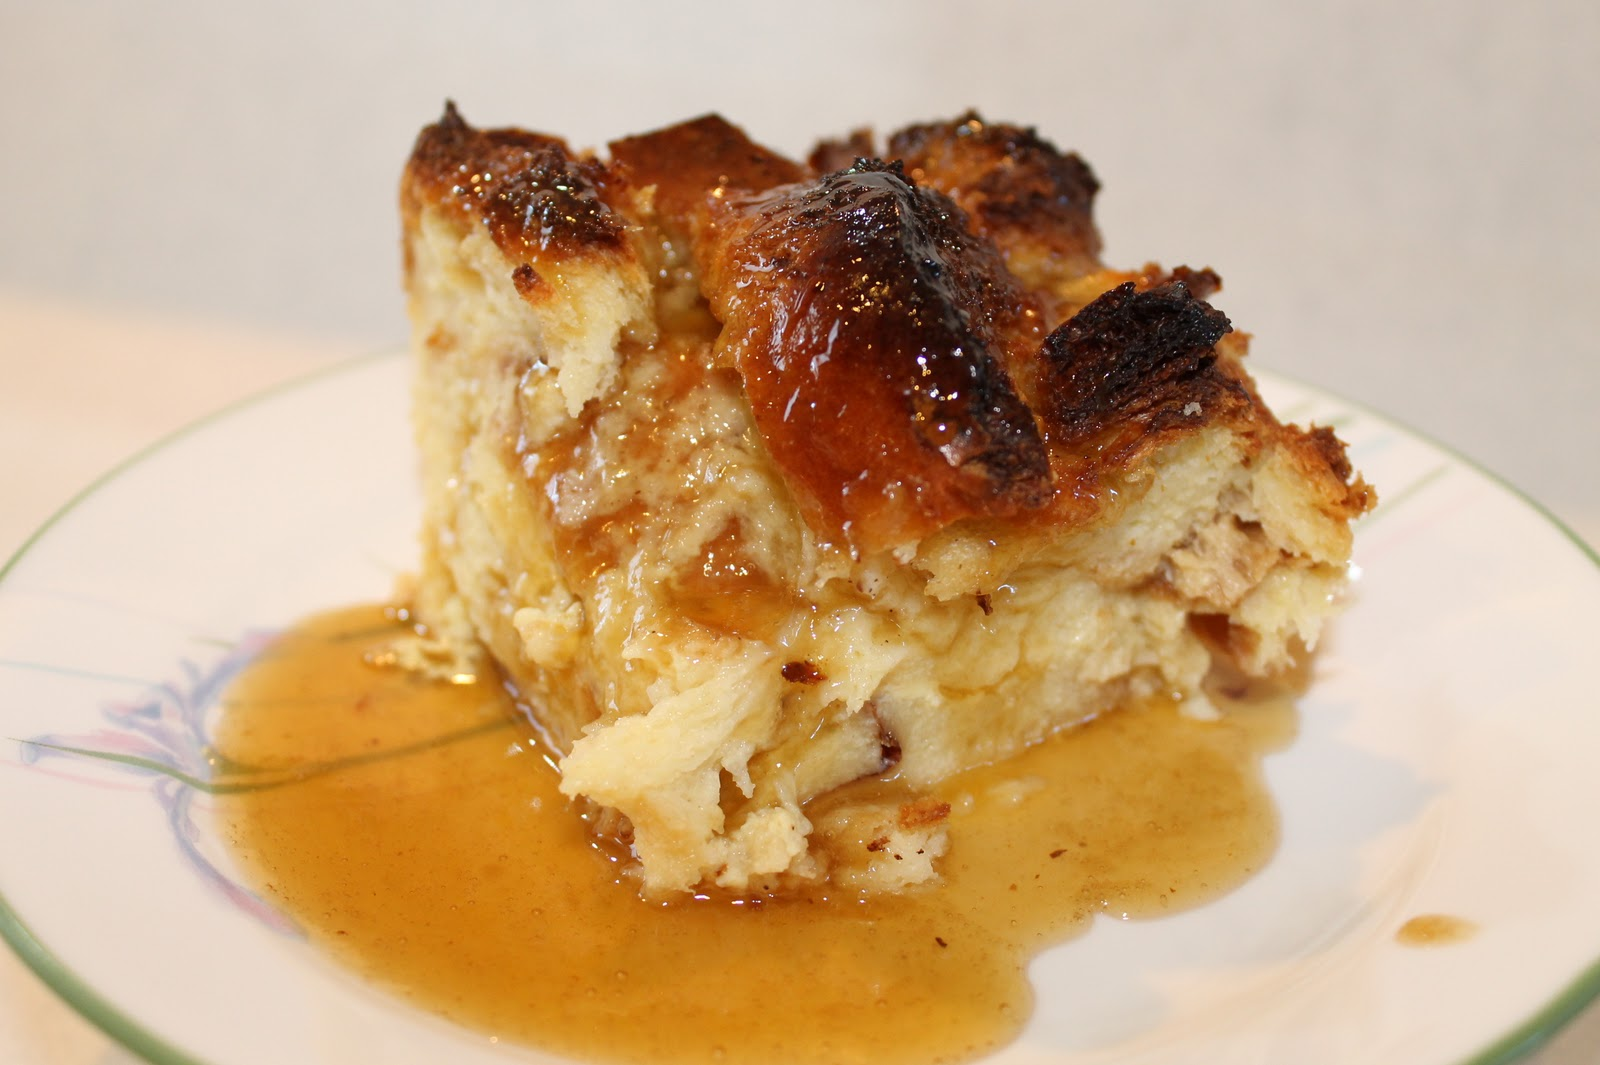 Mélange: Challah Bread Pudding